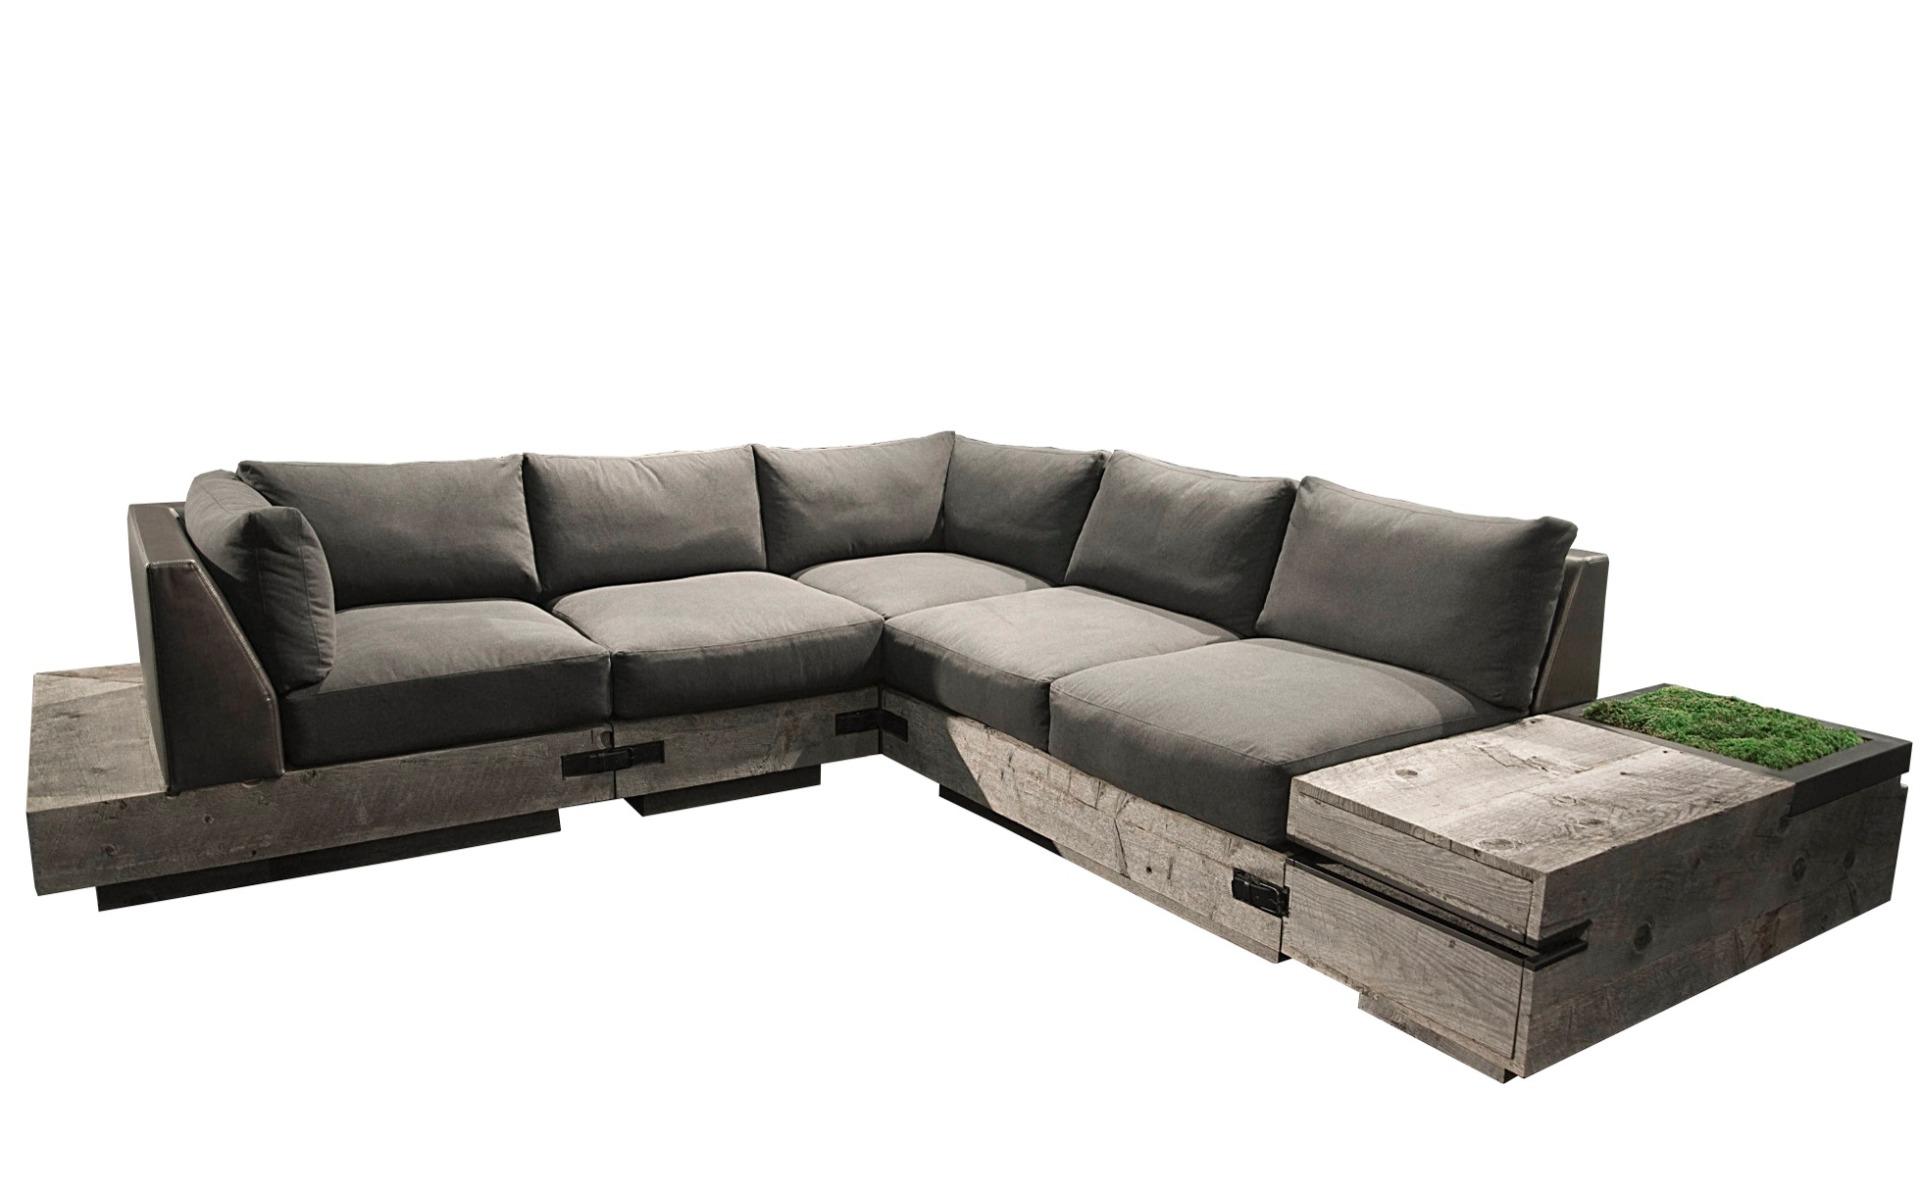 ceniza sectional sofa